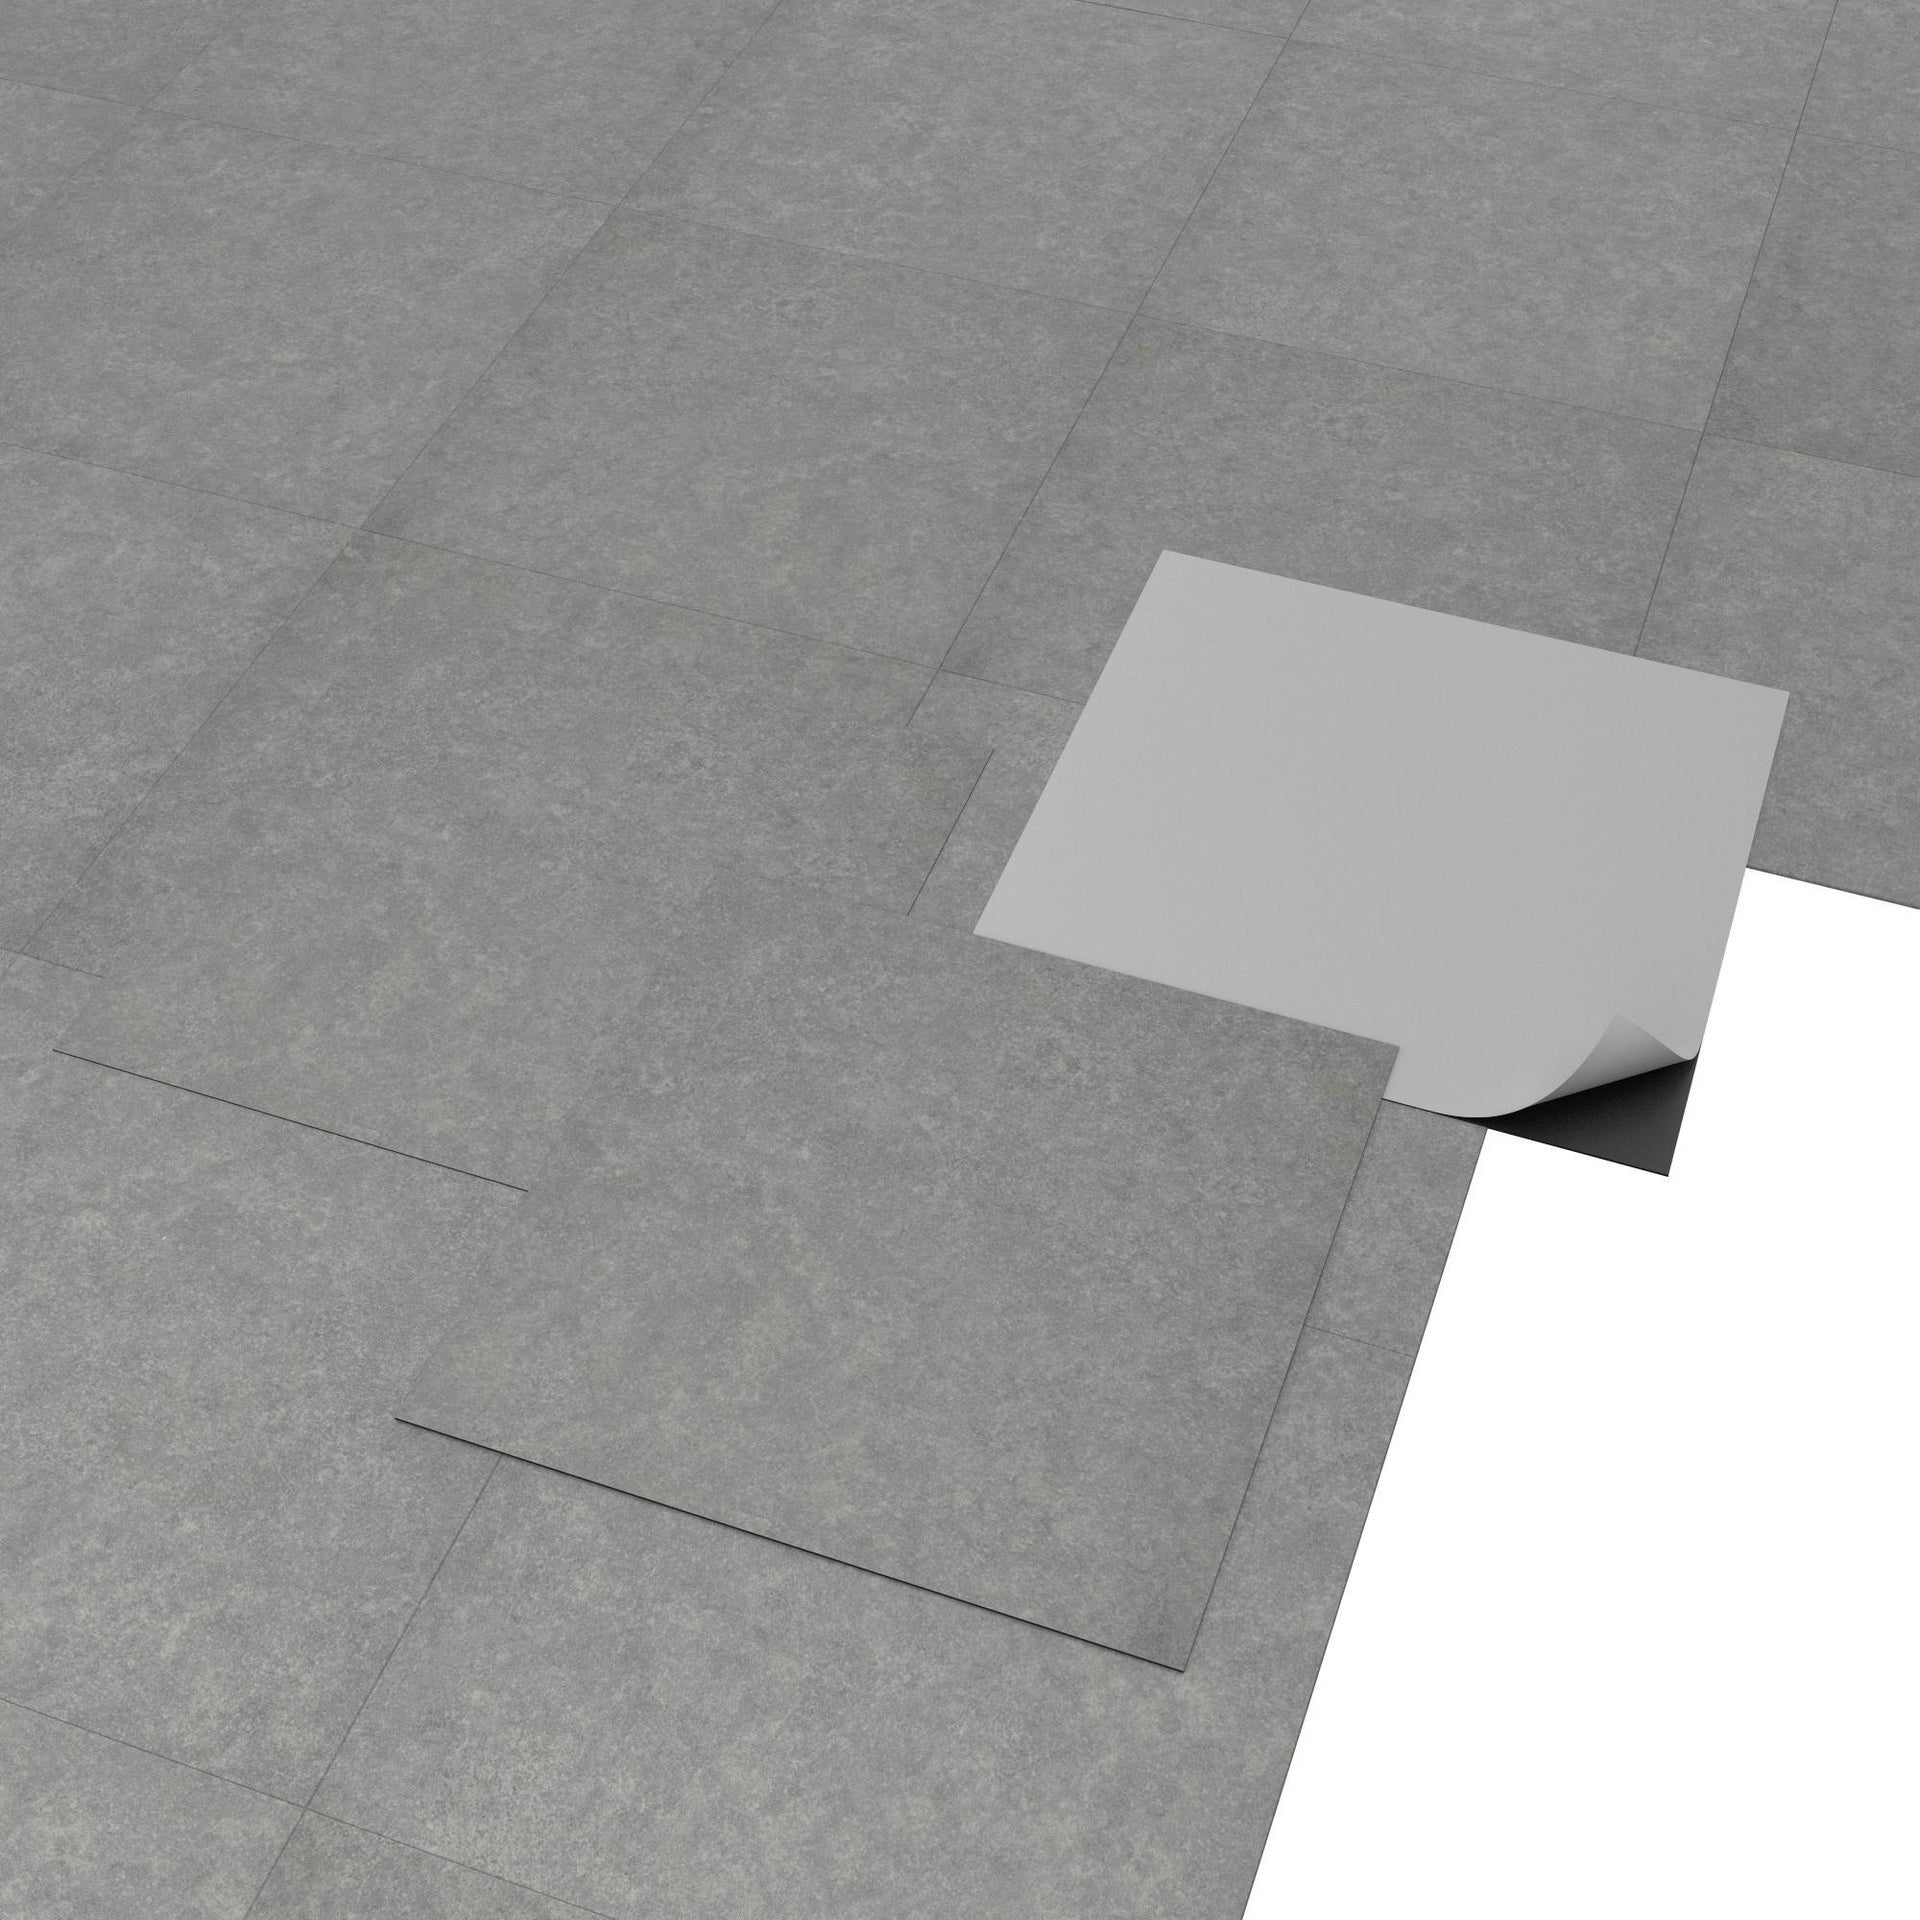 Pavimento PVC adesivo Kamet Sp 1.2 mm grigio / argento - 6